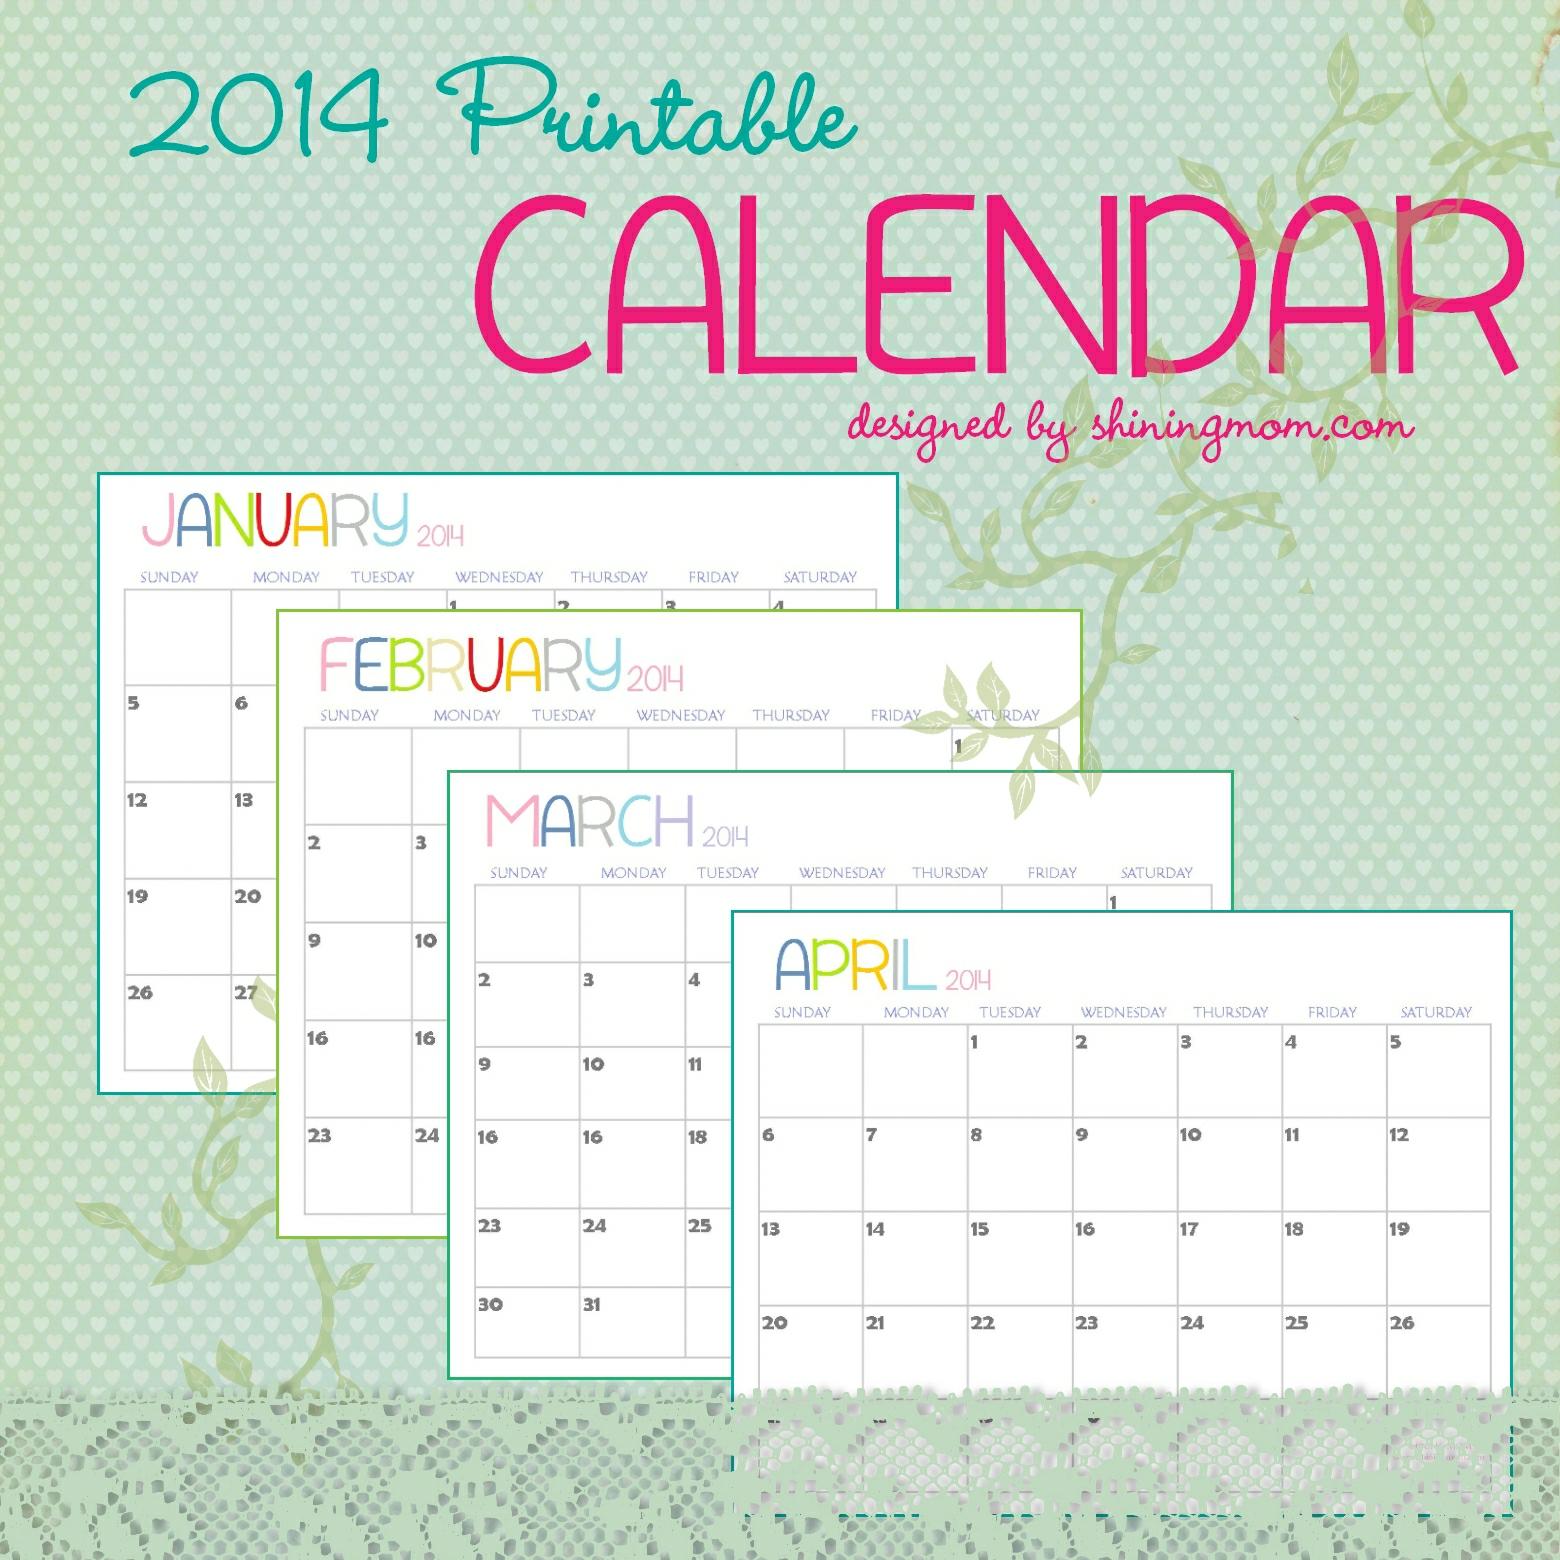 printable calendar: The Free Printable 2014 Calendar By Shining Mom.com Is Here